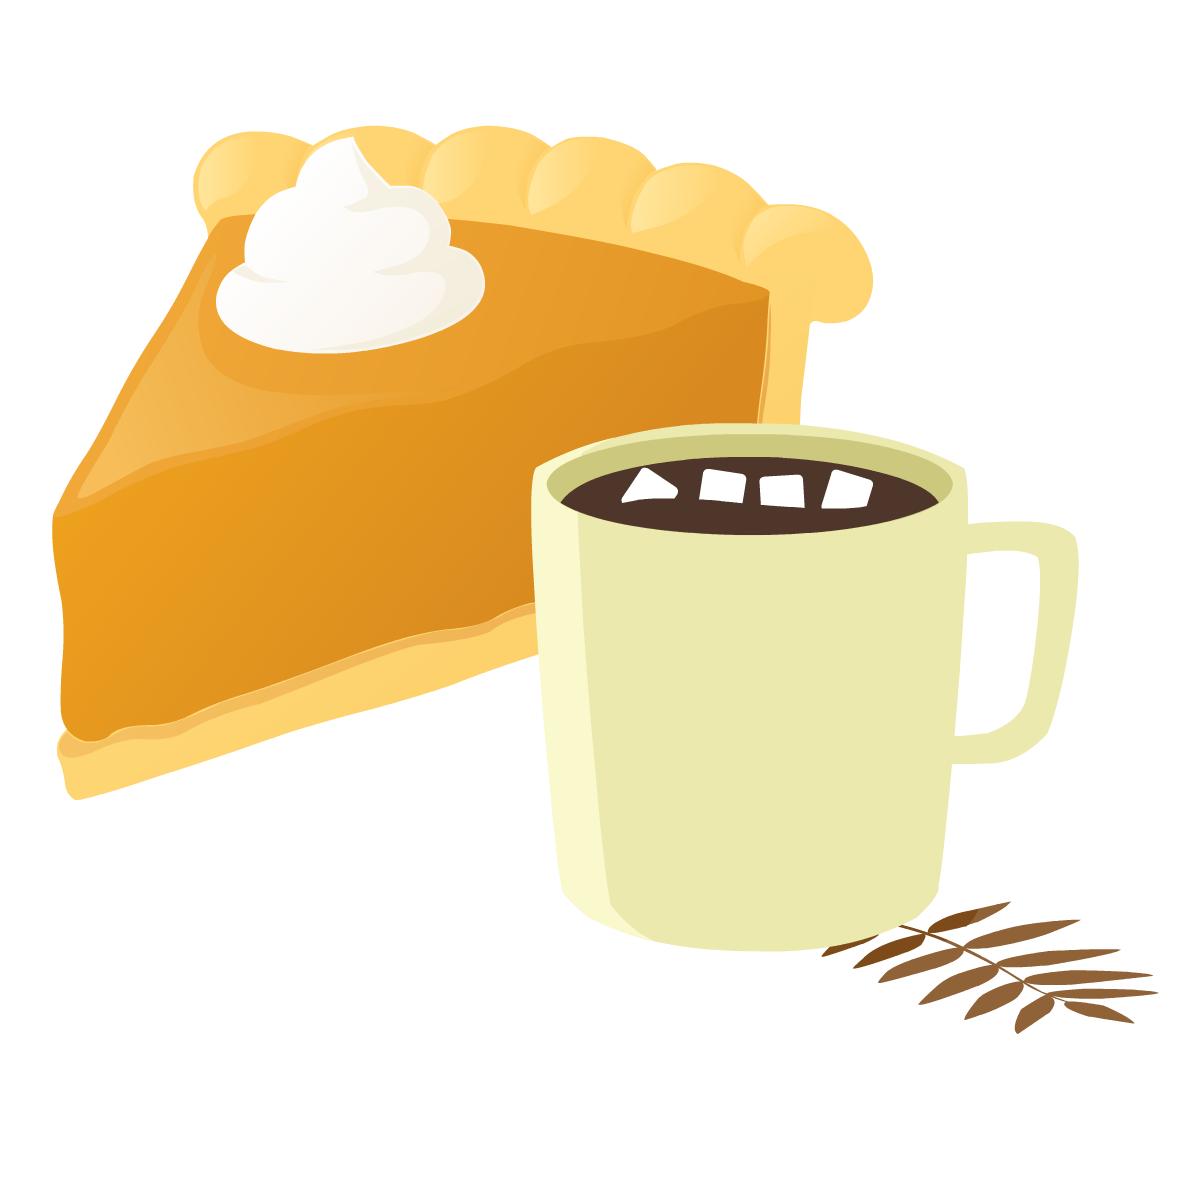 Pumpkin pie and hot chocolate clip art